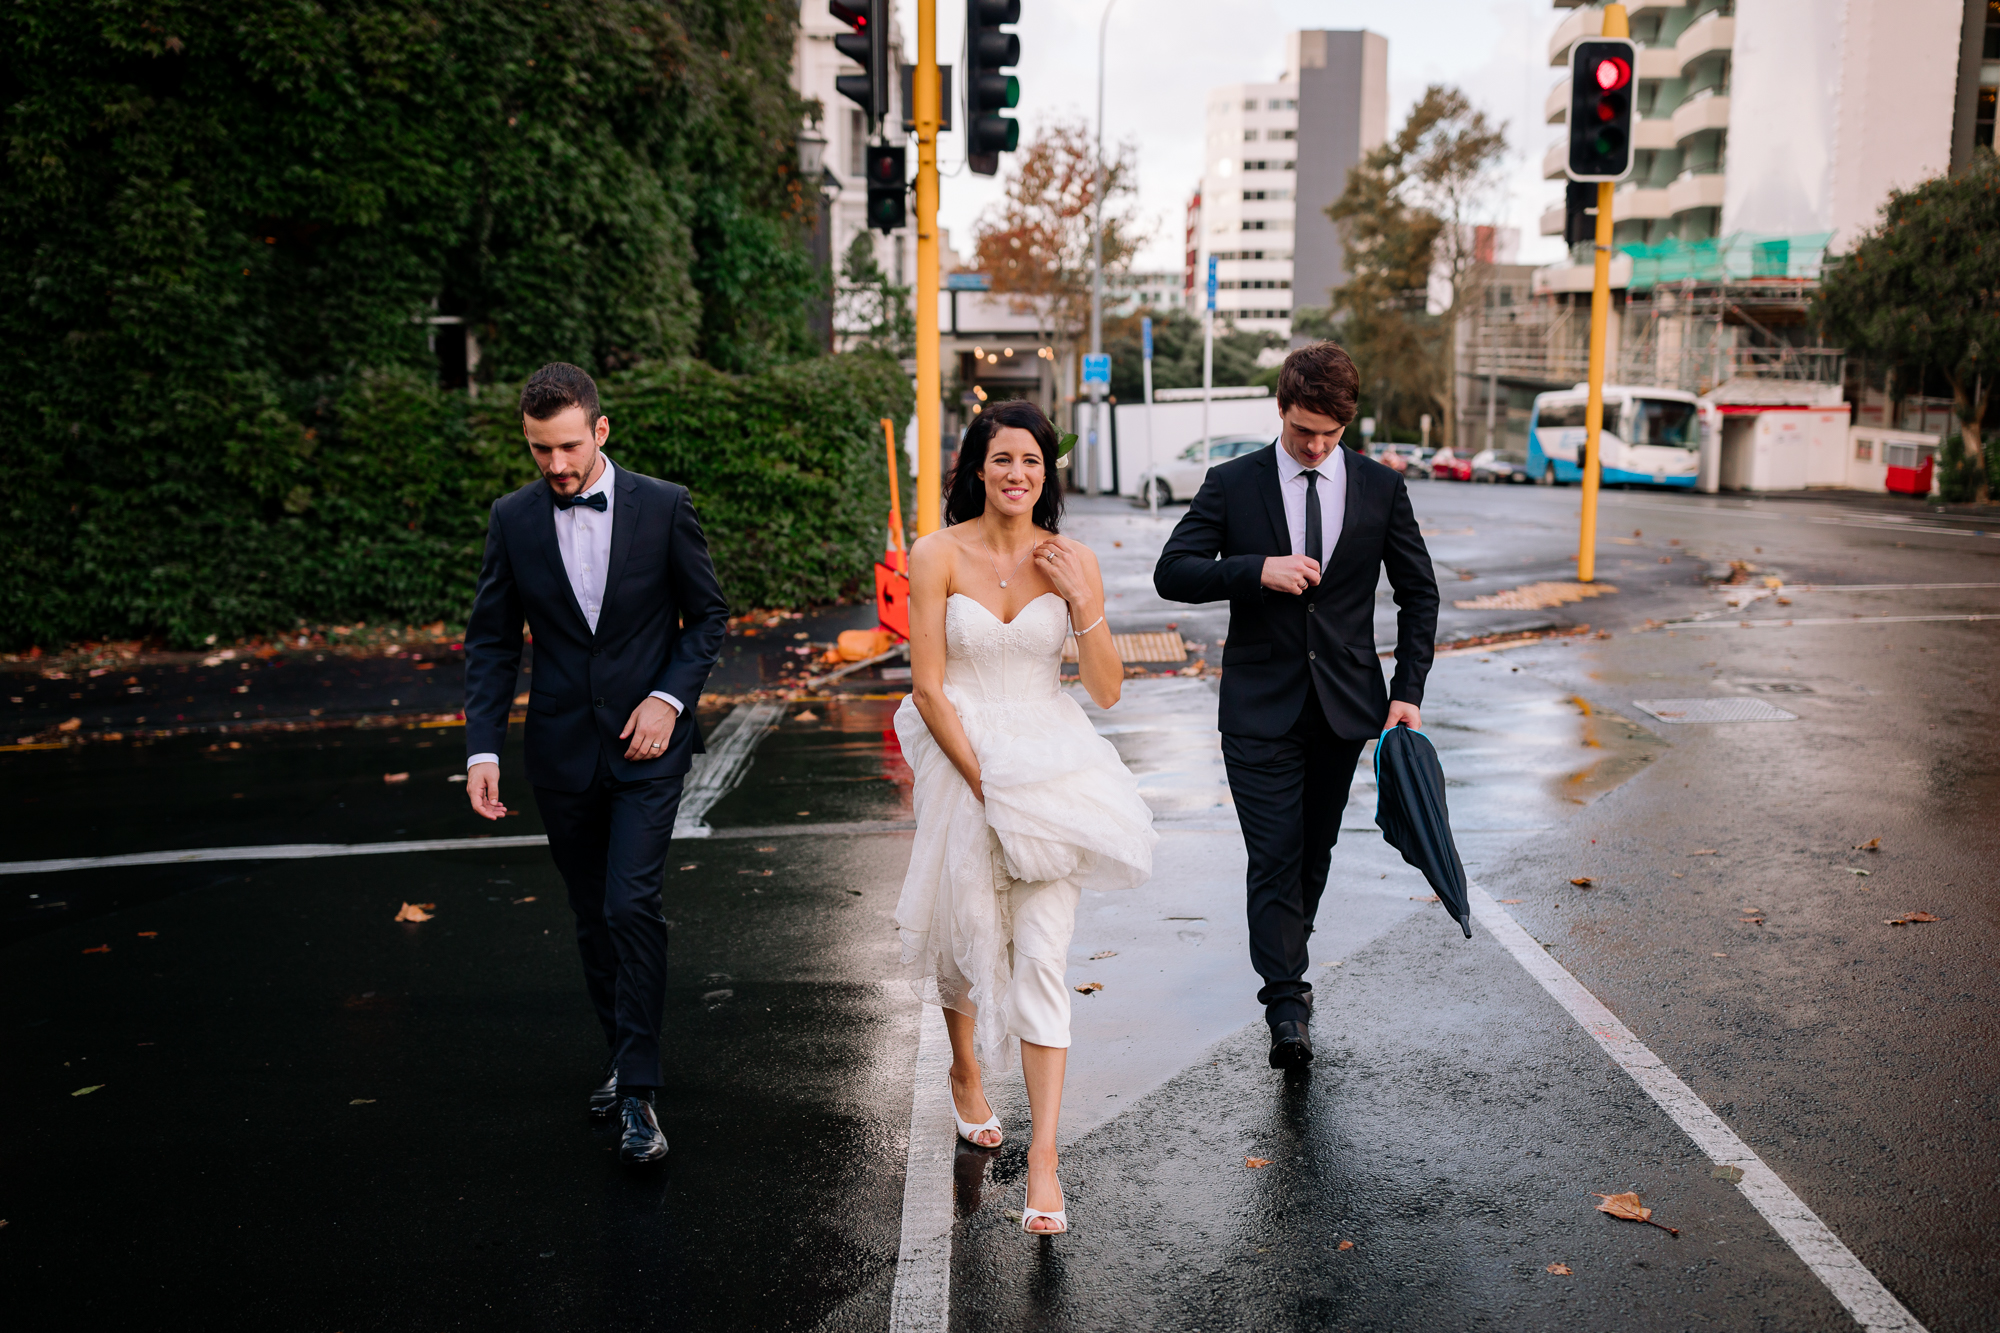 Michael&Mel5912018Pilkingtons-Auckland.jpg